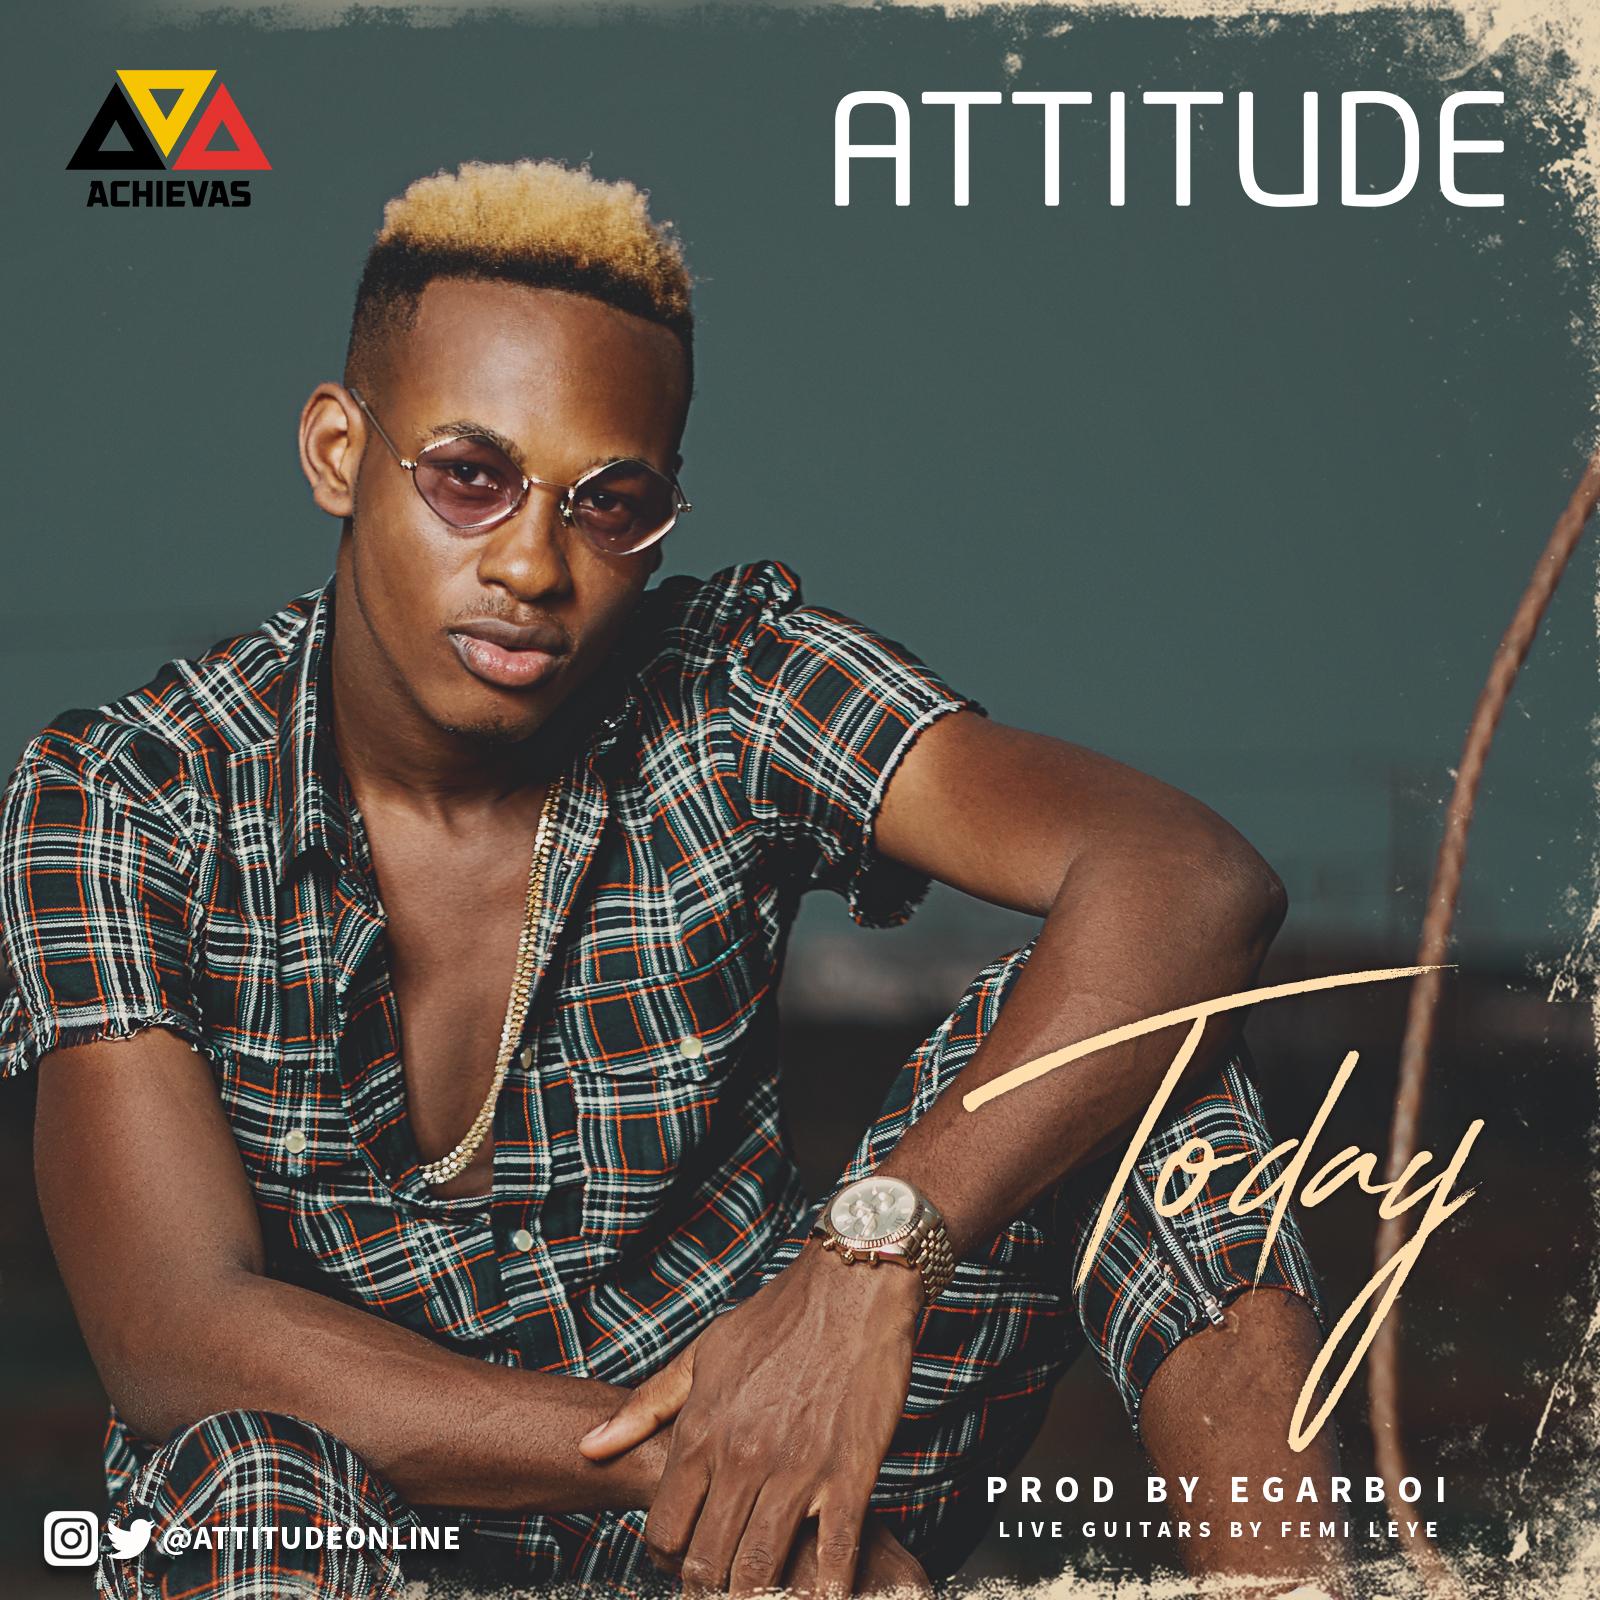 VIDEO: Attitude - Today